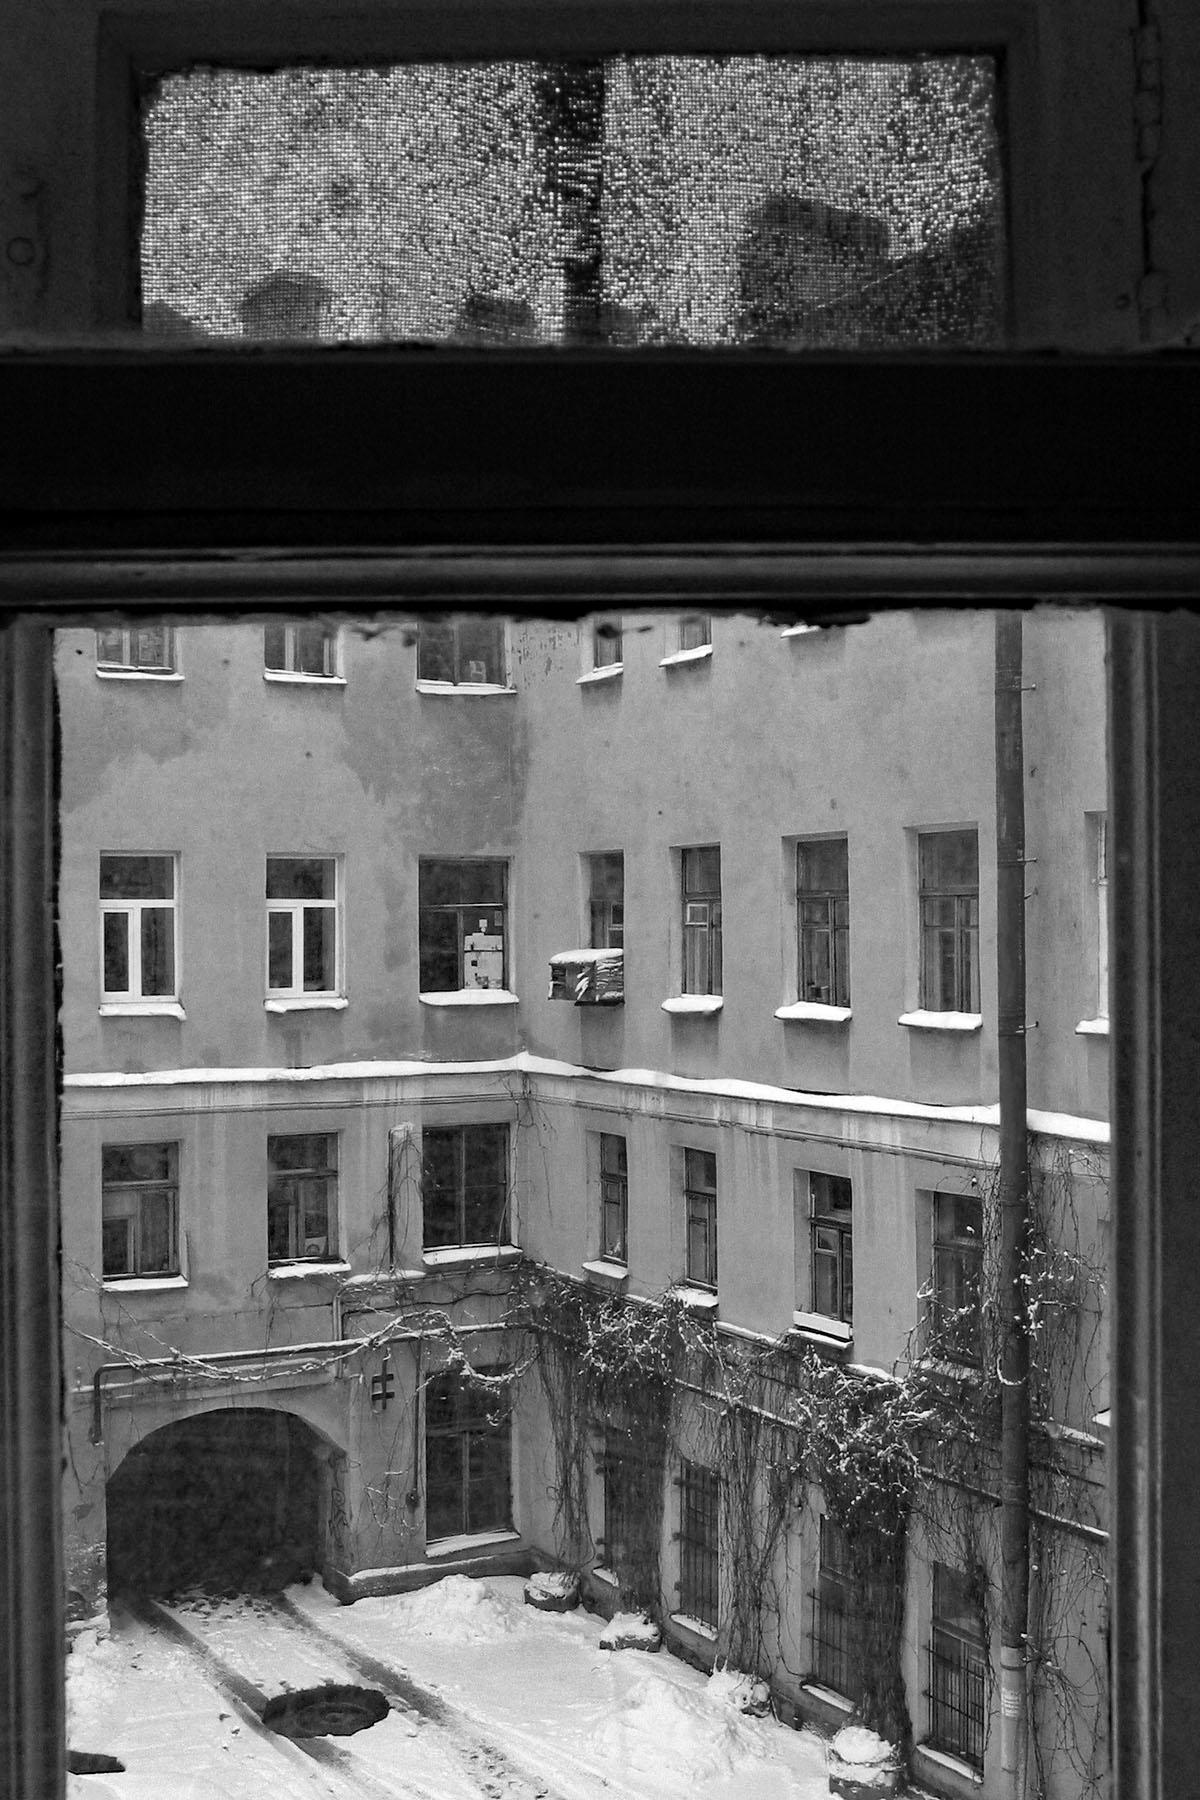 Courtyard_St._Petersburg_Russia